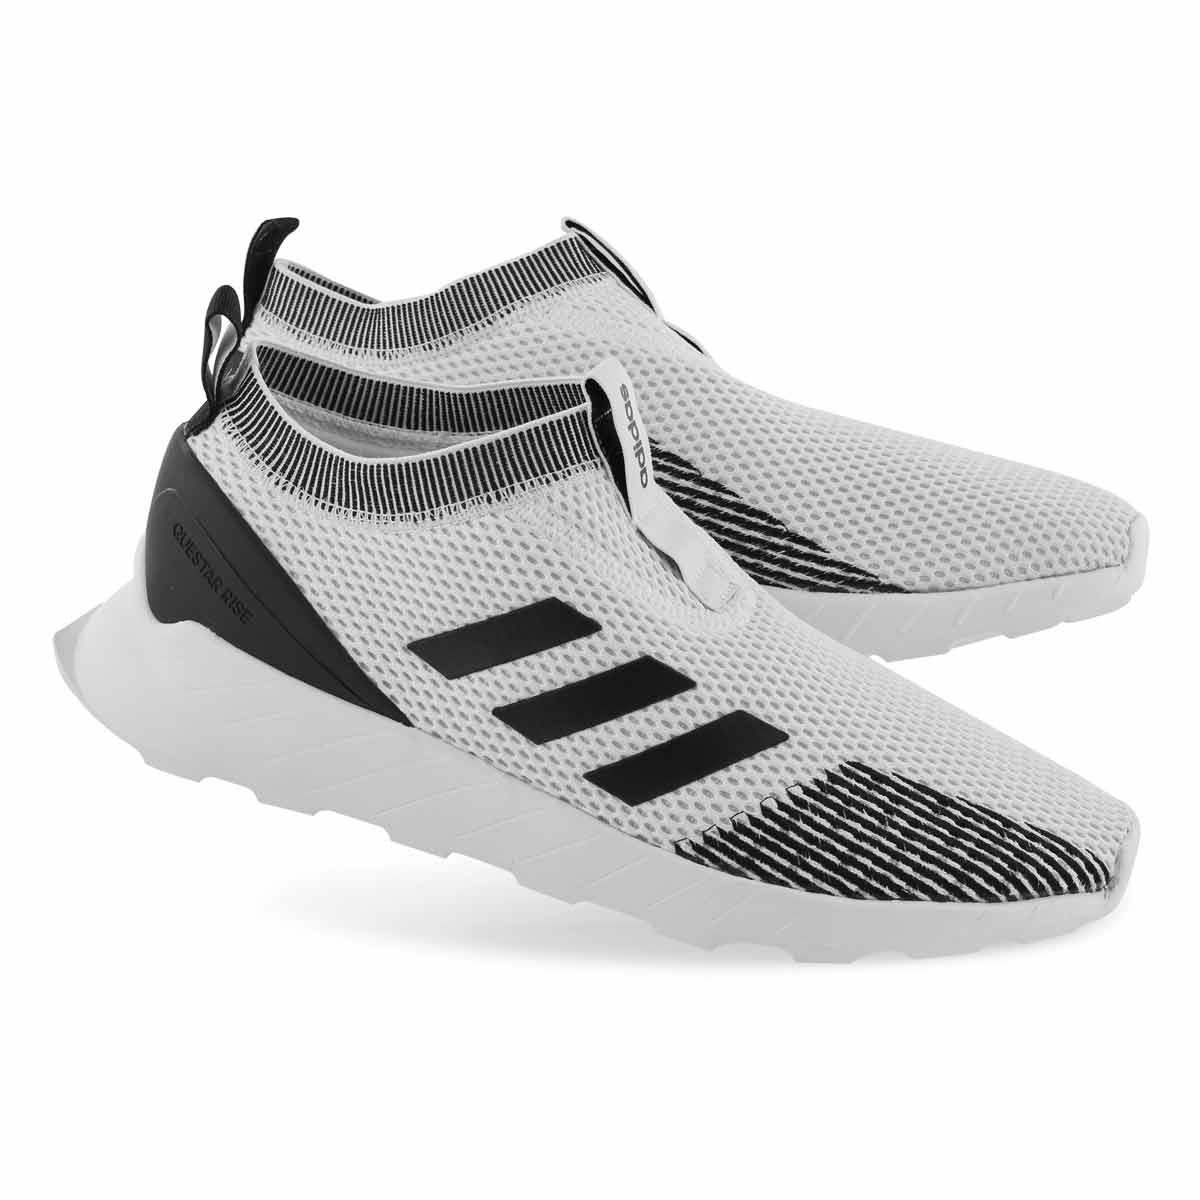 Mns Questar Rise Sock wht/blk/gry runner